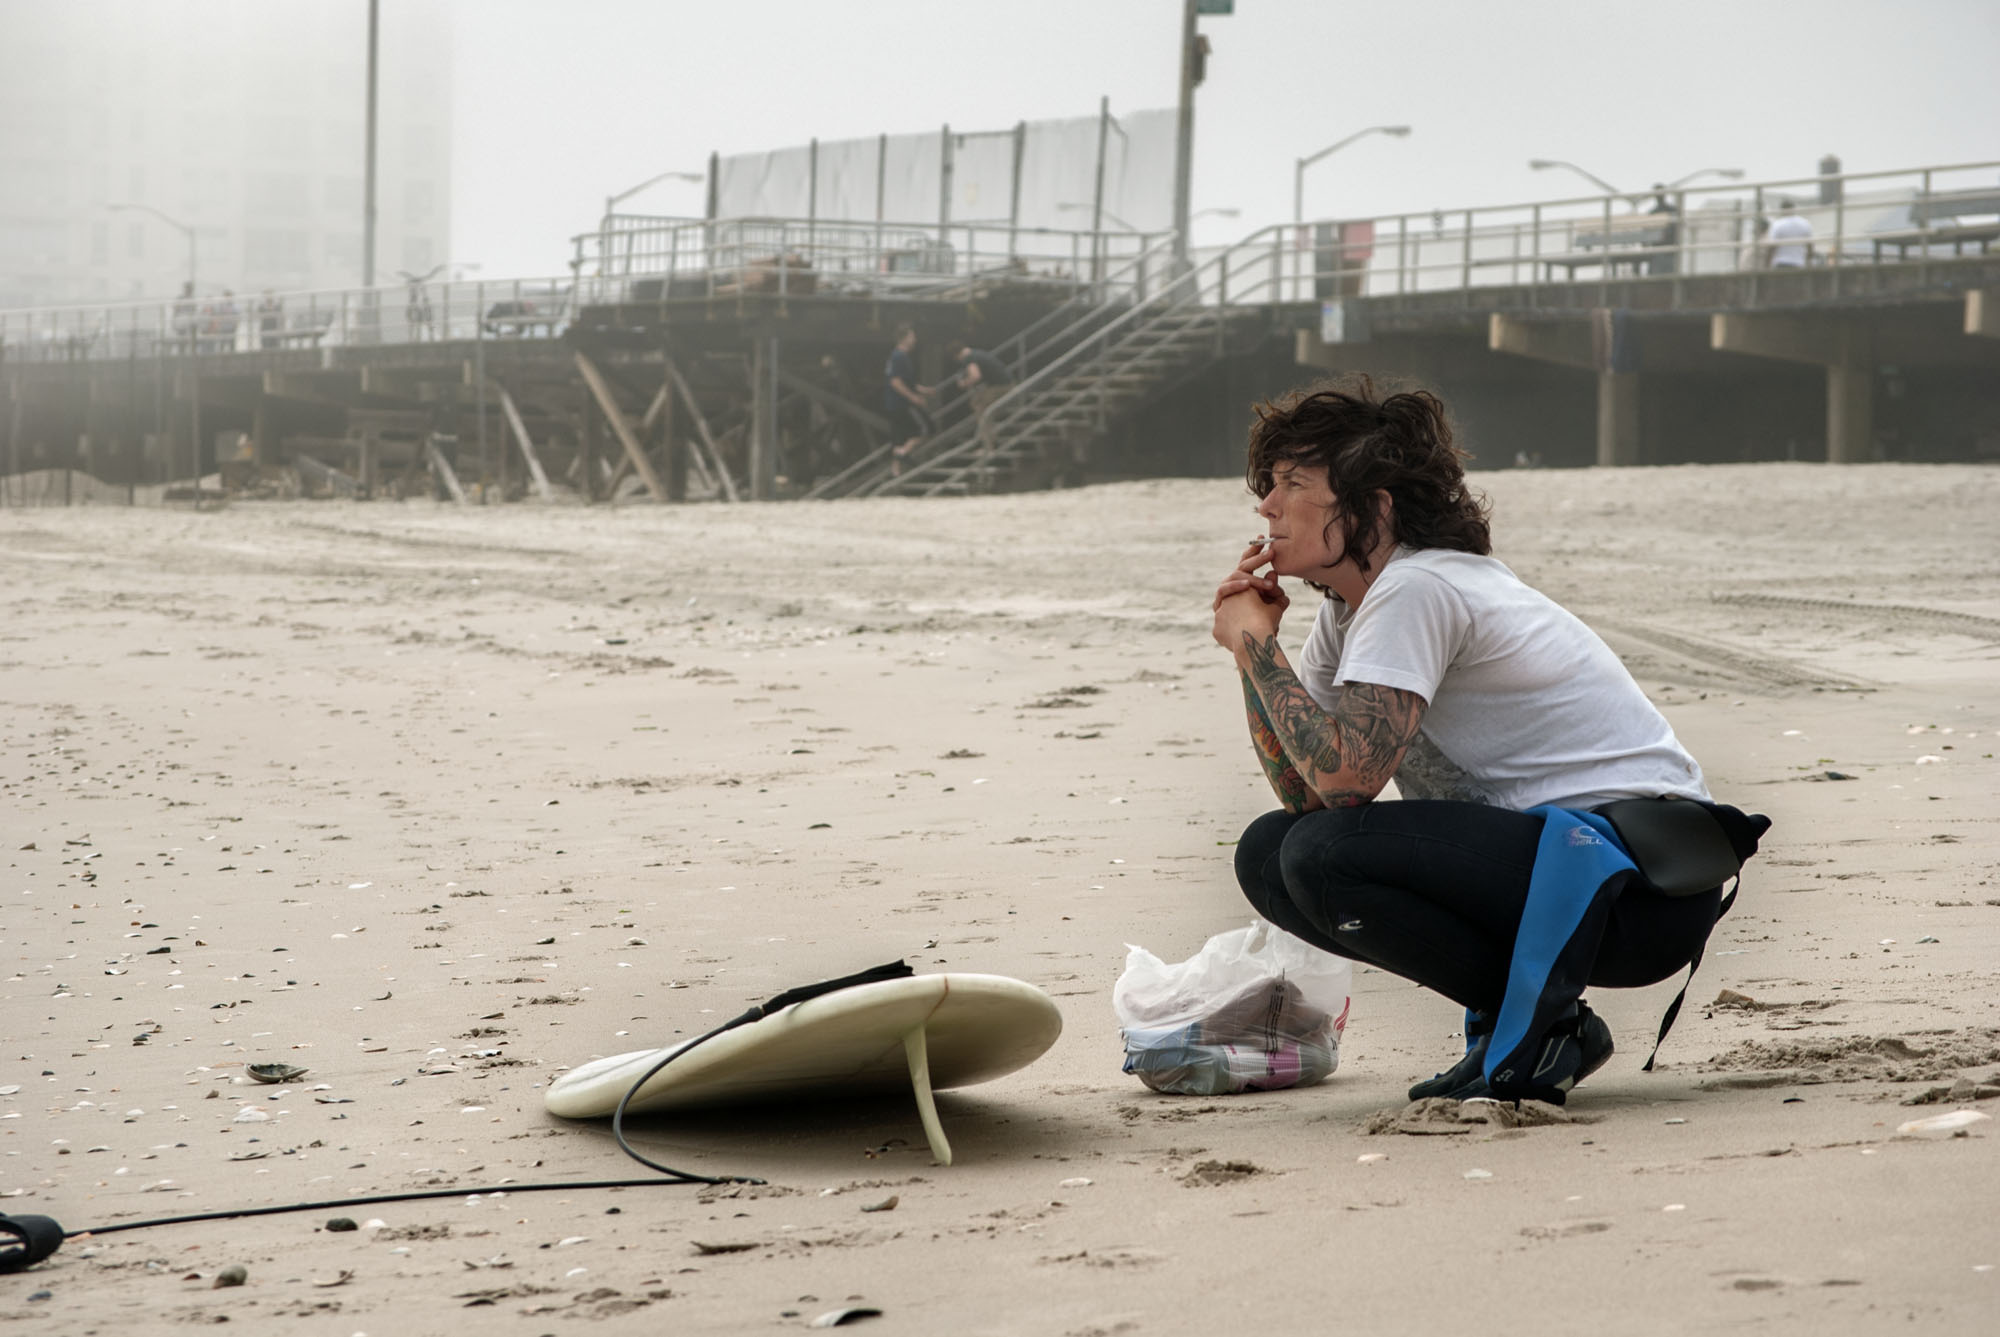 Rock_Surfer_1205.jpg